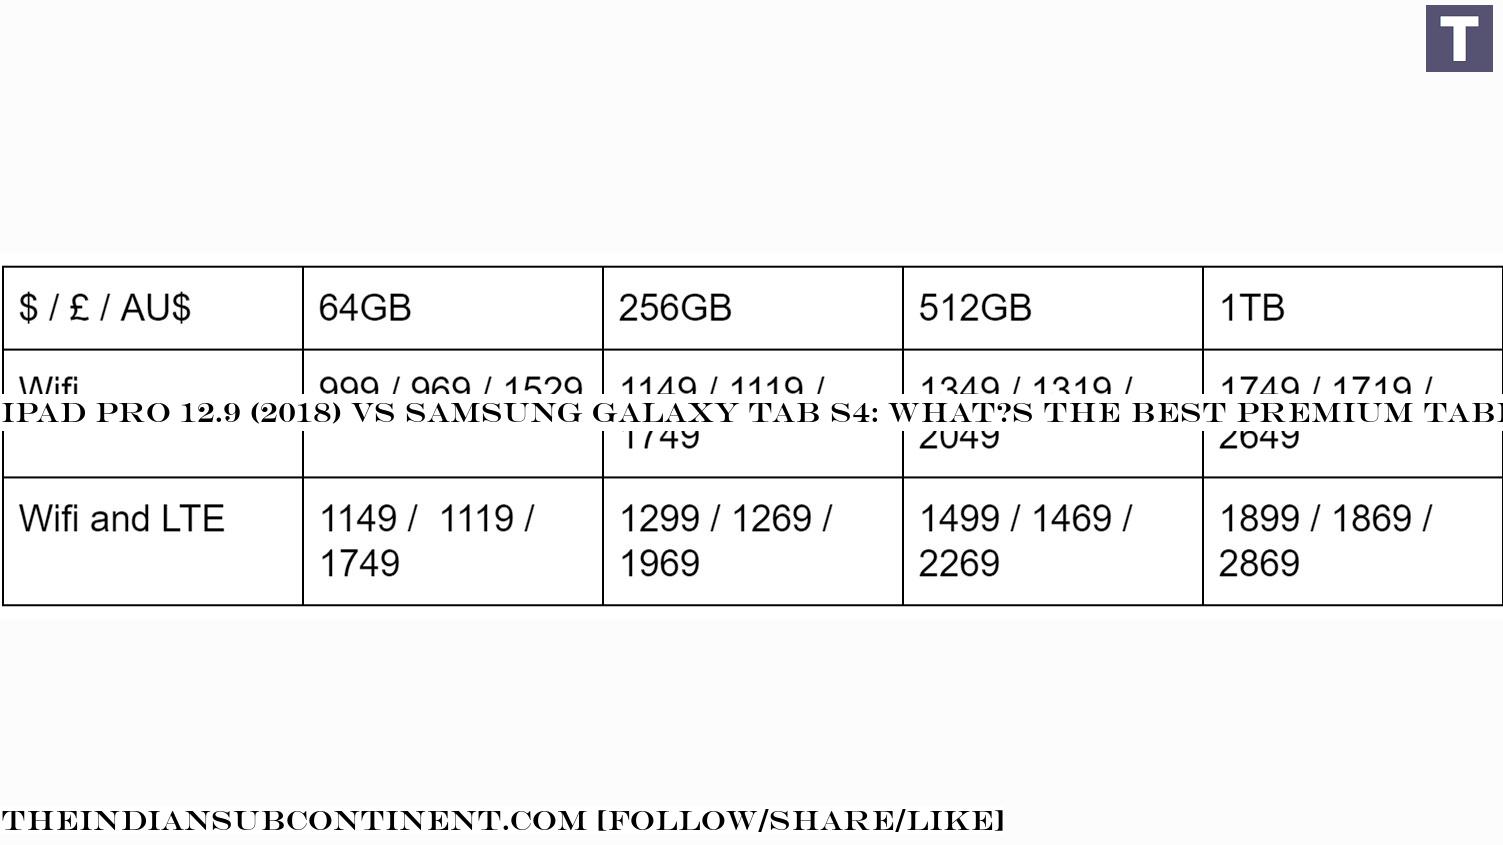 iPad Pro 12 9 (2018) vs Samsung Galaxy Tab S4: what's the